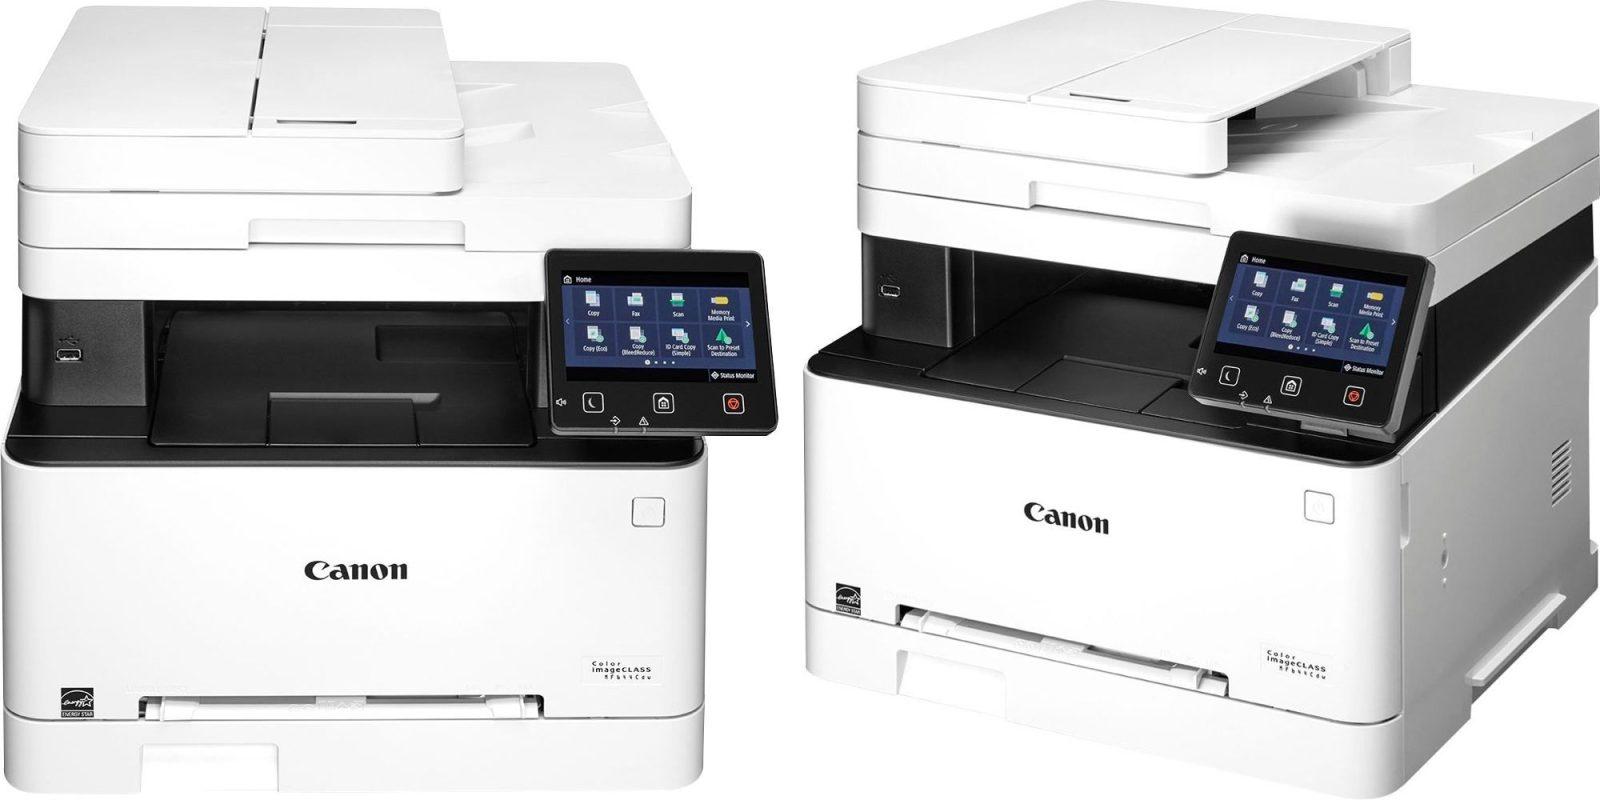 Enjoy AirPrint & Google Cloud Print w/ Canon's color AiO laser printer: $235 (Reg. up to $400)